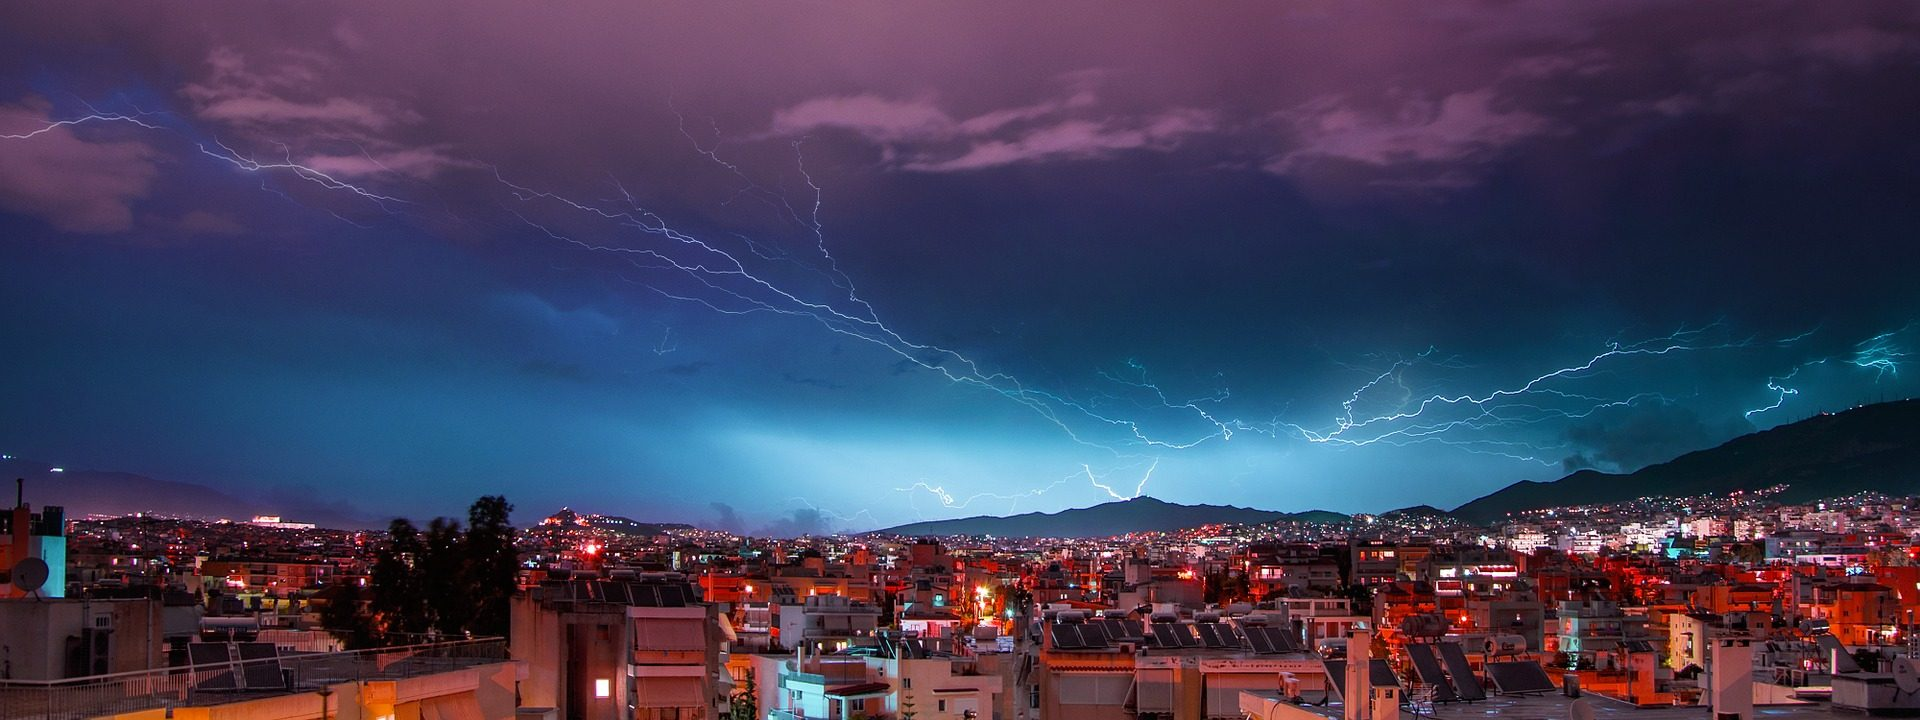 Città, notte, luci, Tempesta, raggi, relámpagos - Sfondi HD - Professor-falken.com